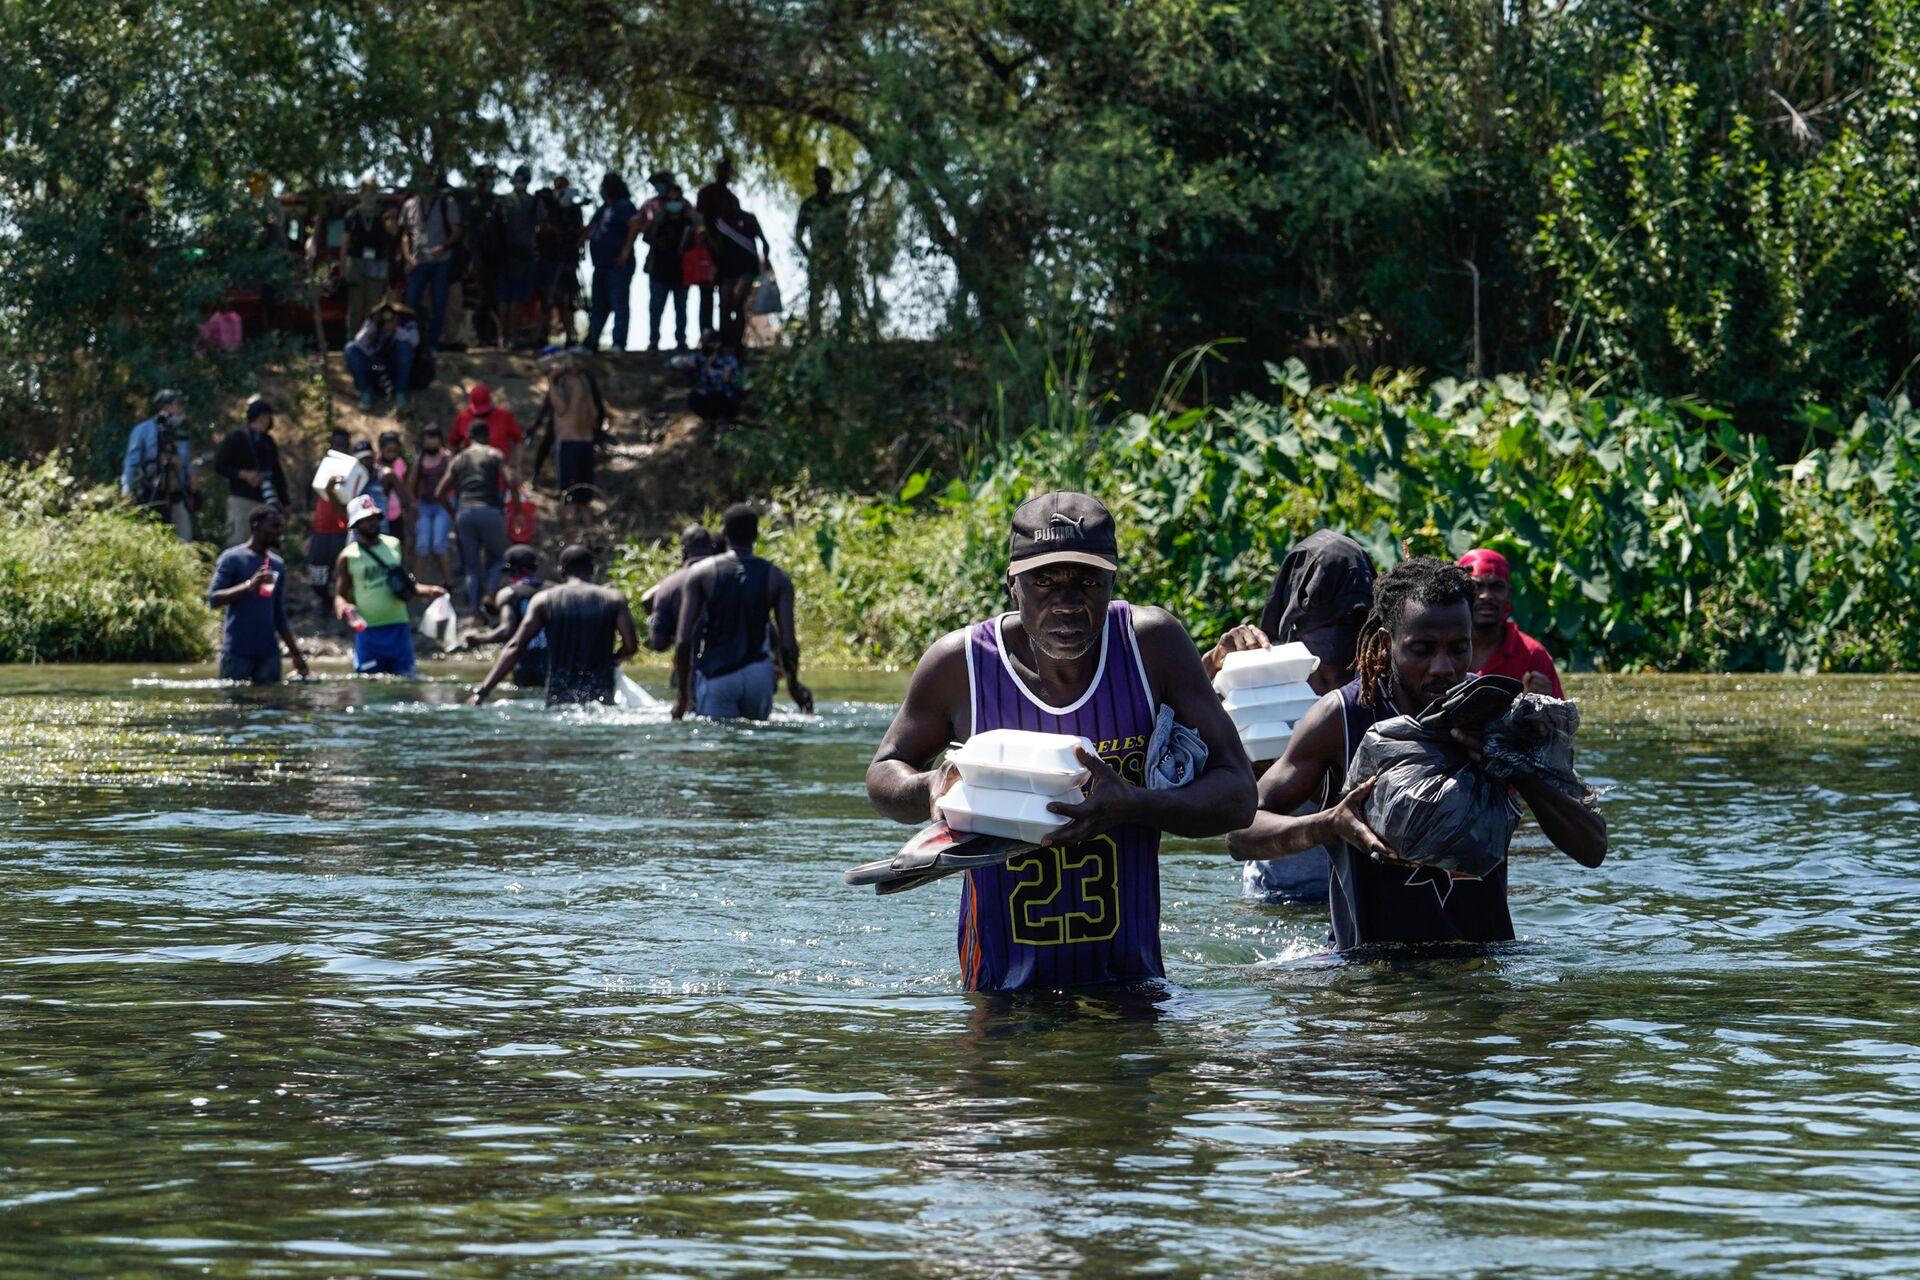 Мигранты из Гаити пересекают границу США и Мексики на реке Рио-Гранде - Sputnik International, 1920, 24.09.2021